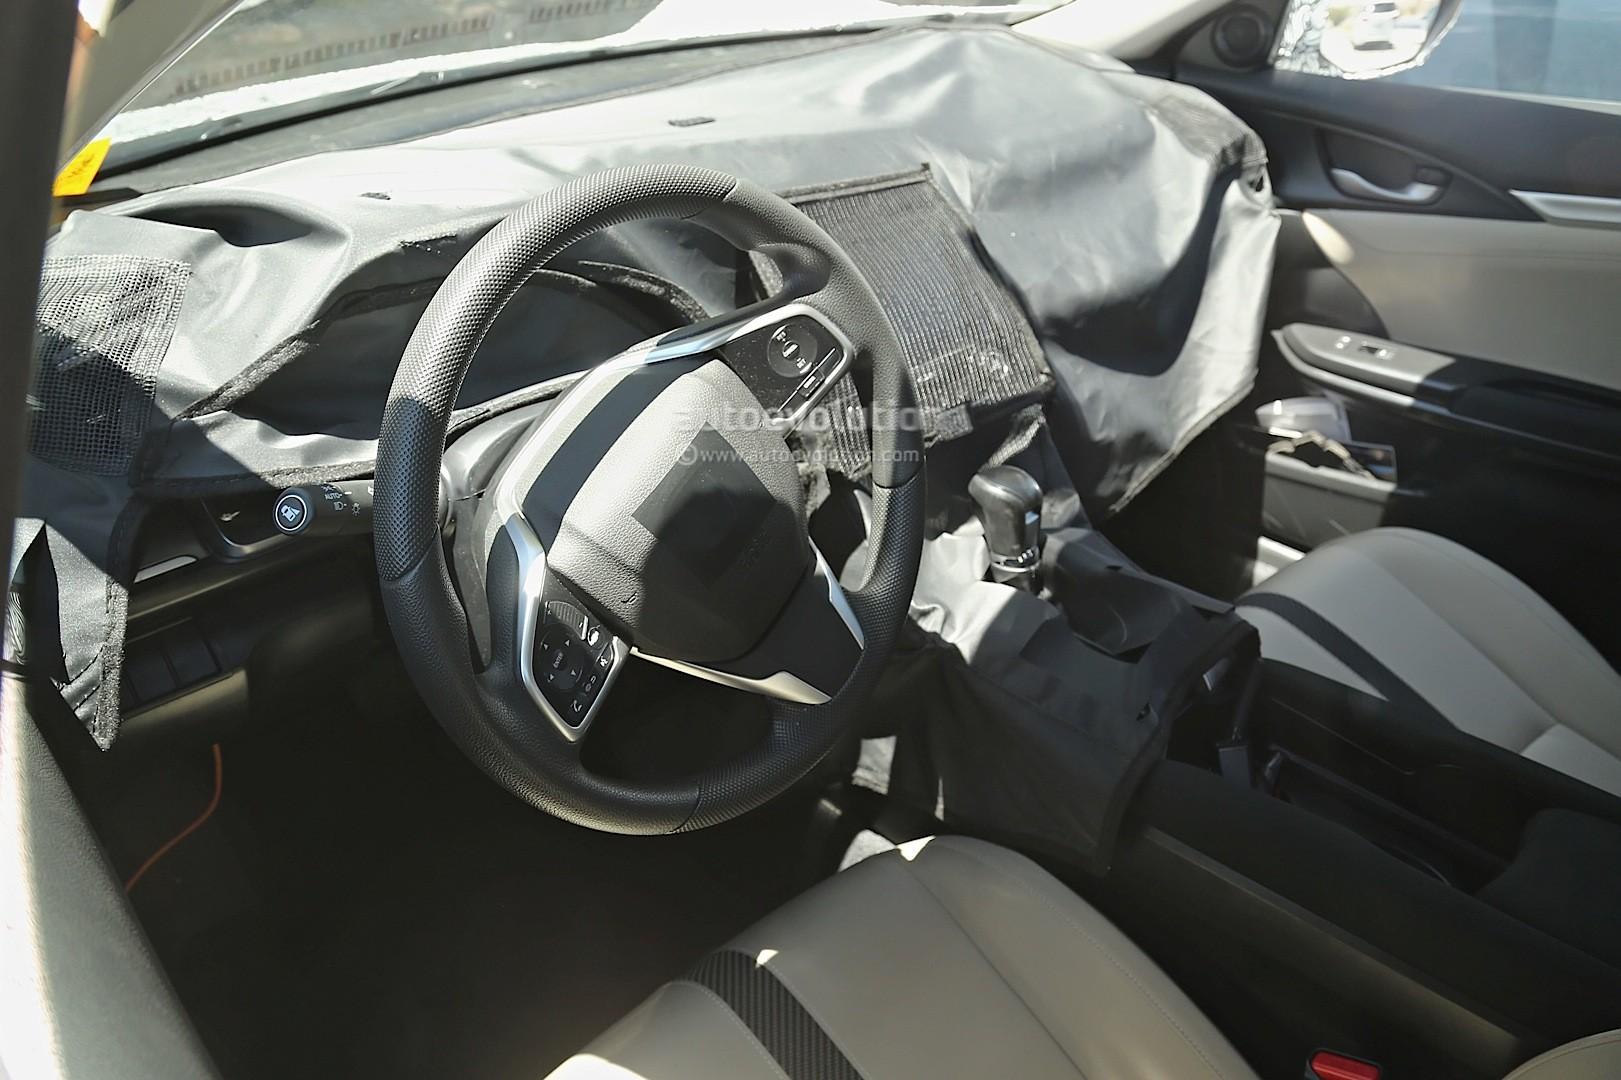 spyshots next gen 2017 honda civic sedan interior revealed new